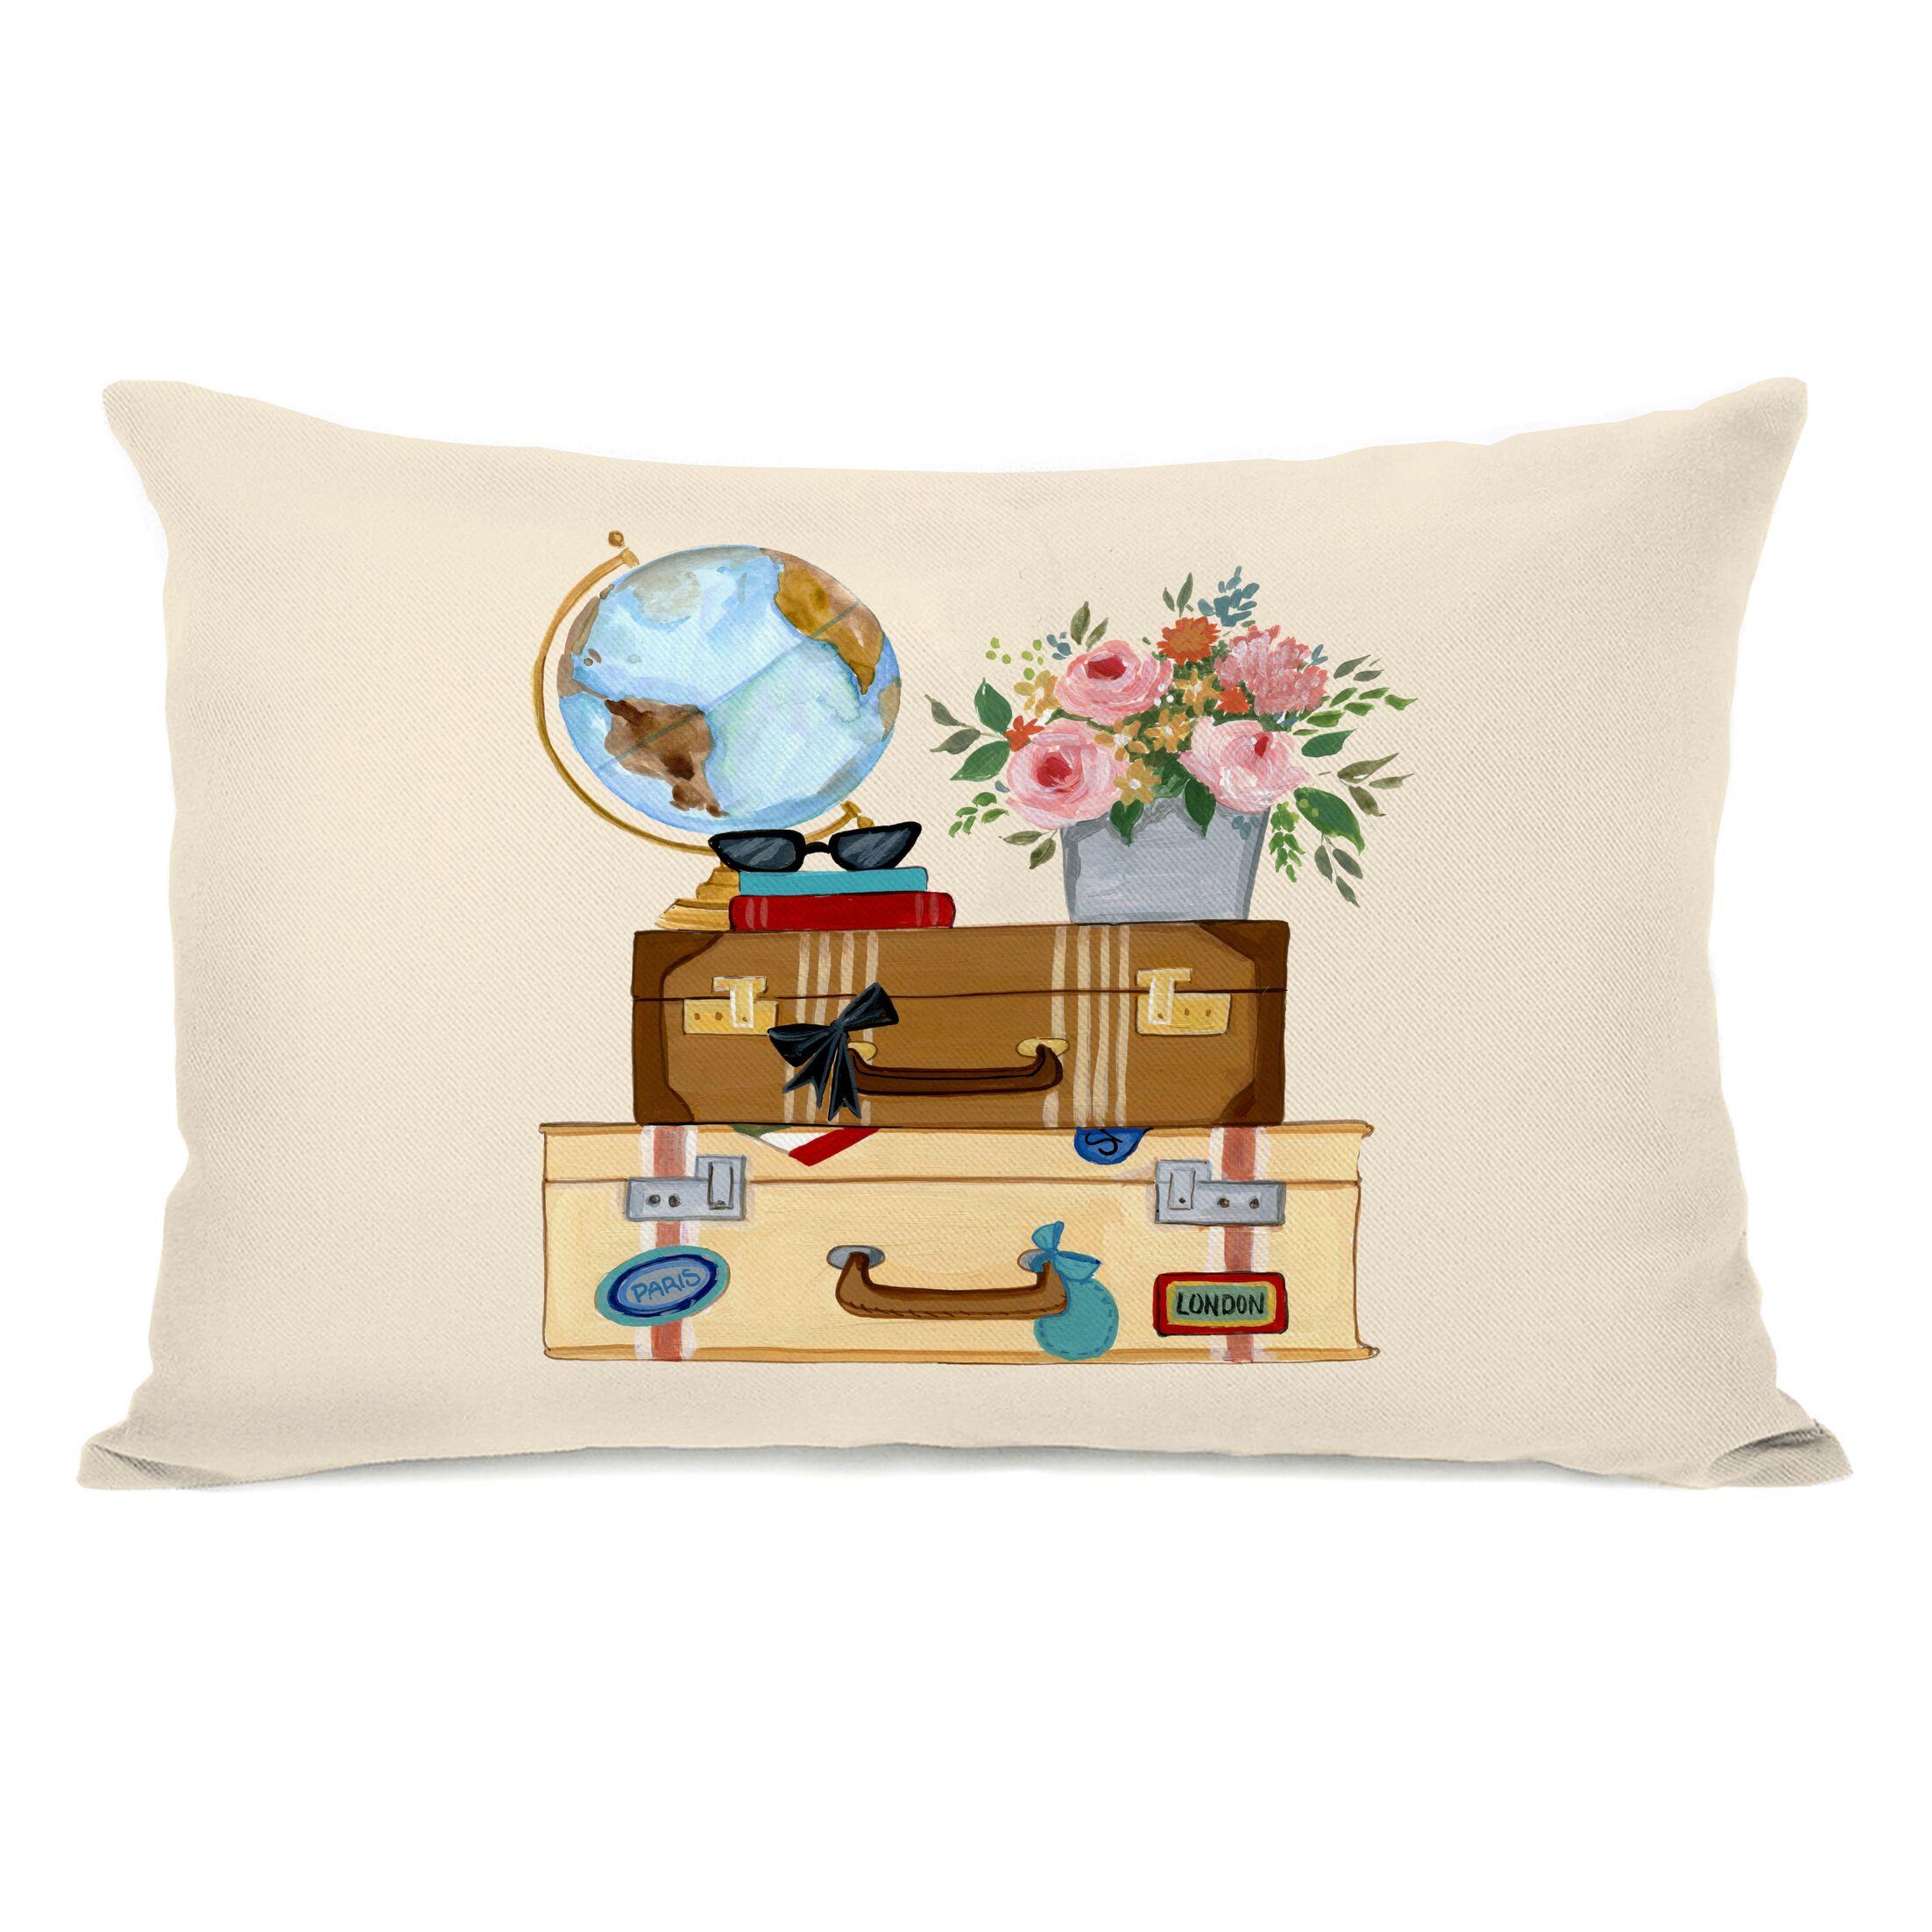 Corder Travel Things Lumbar Pillow